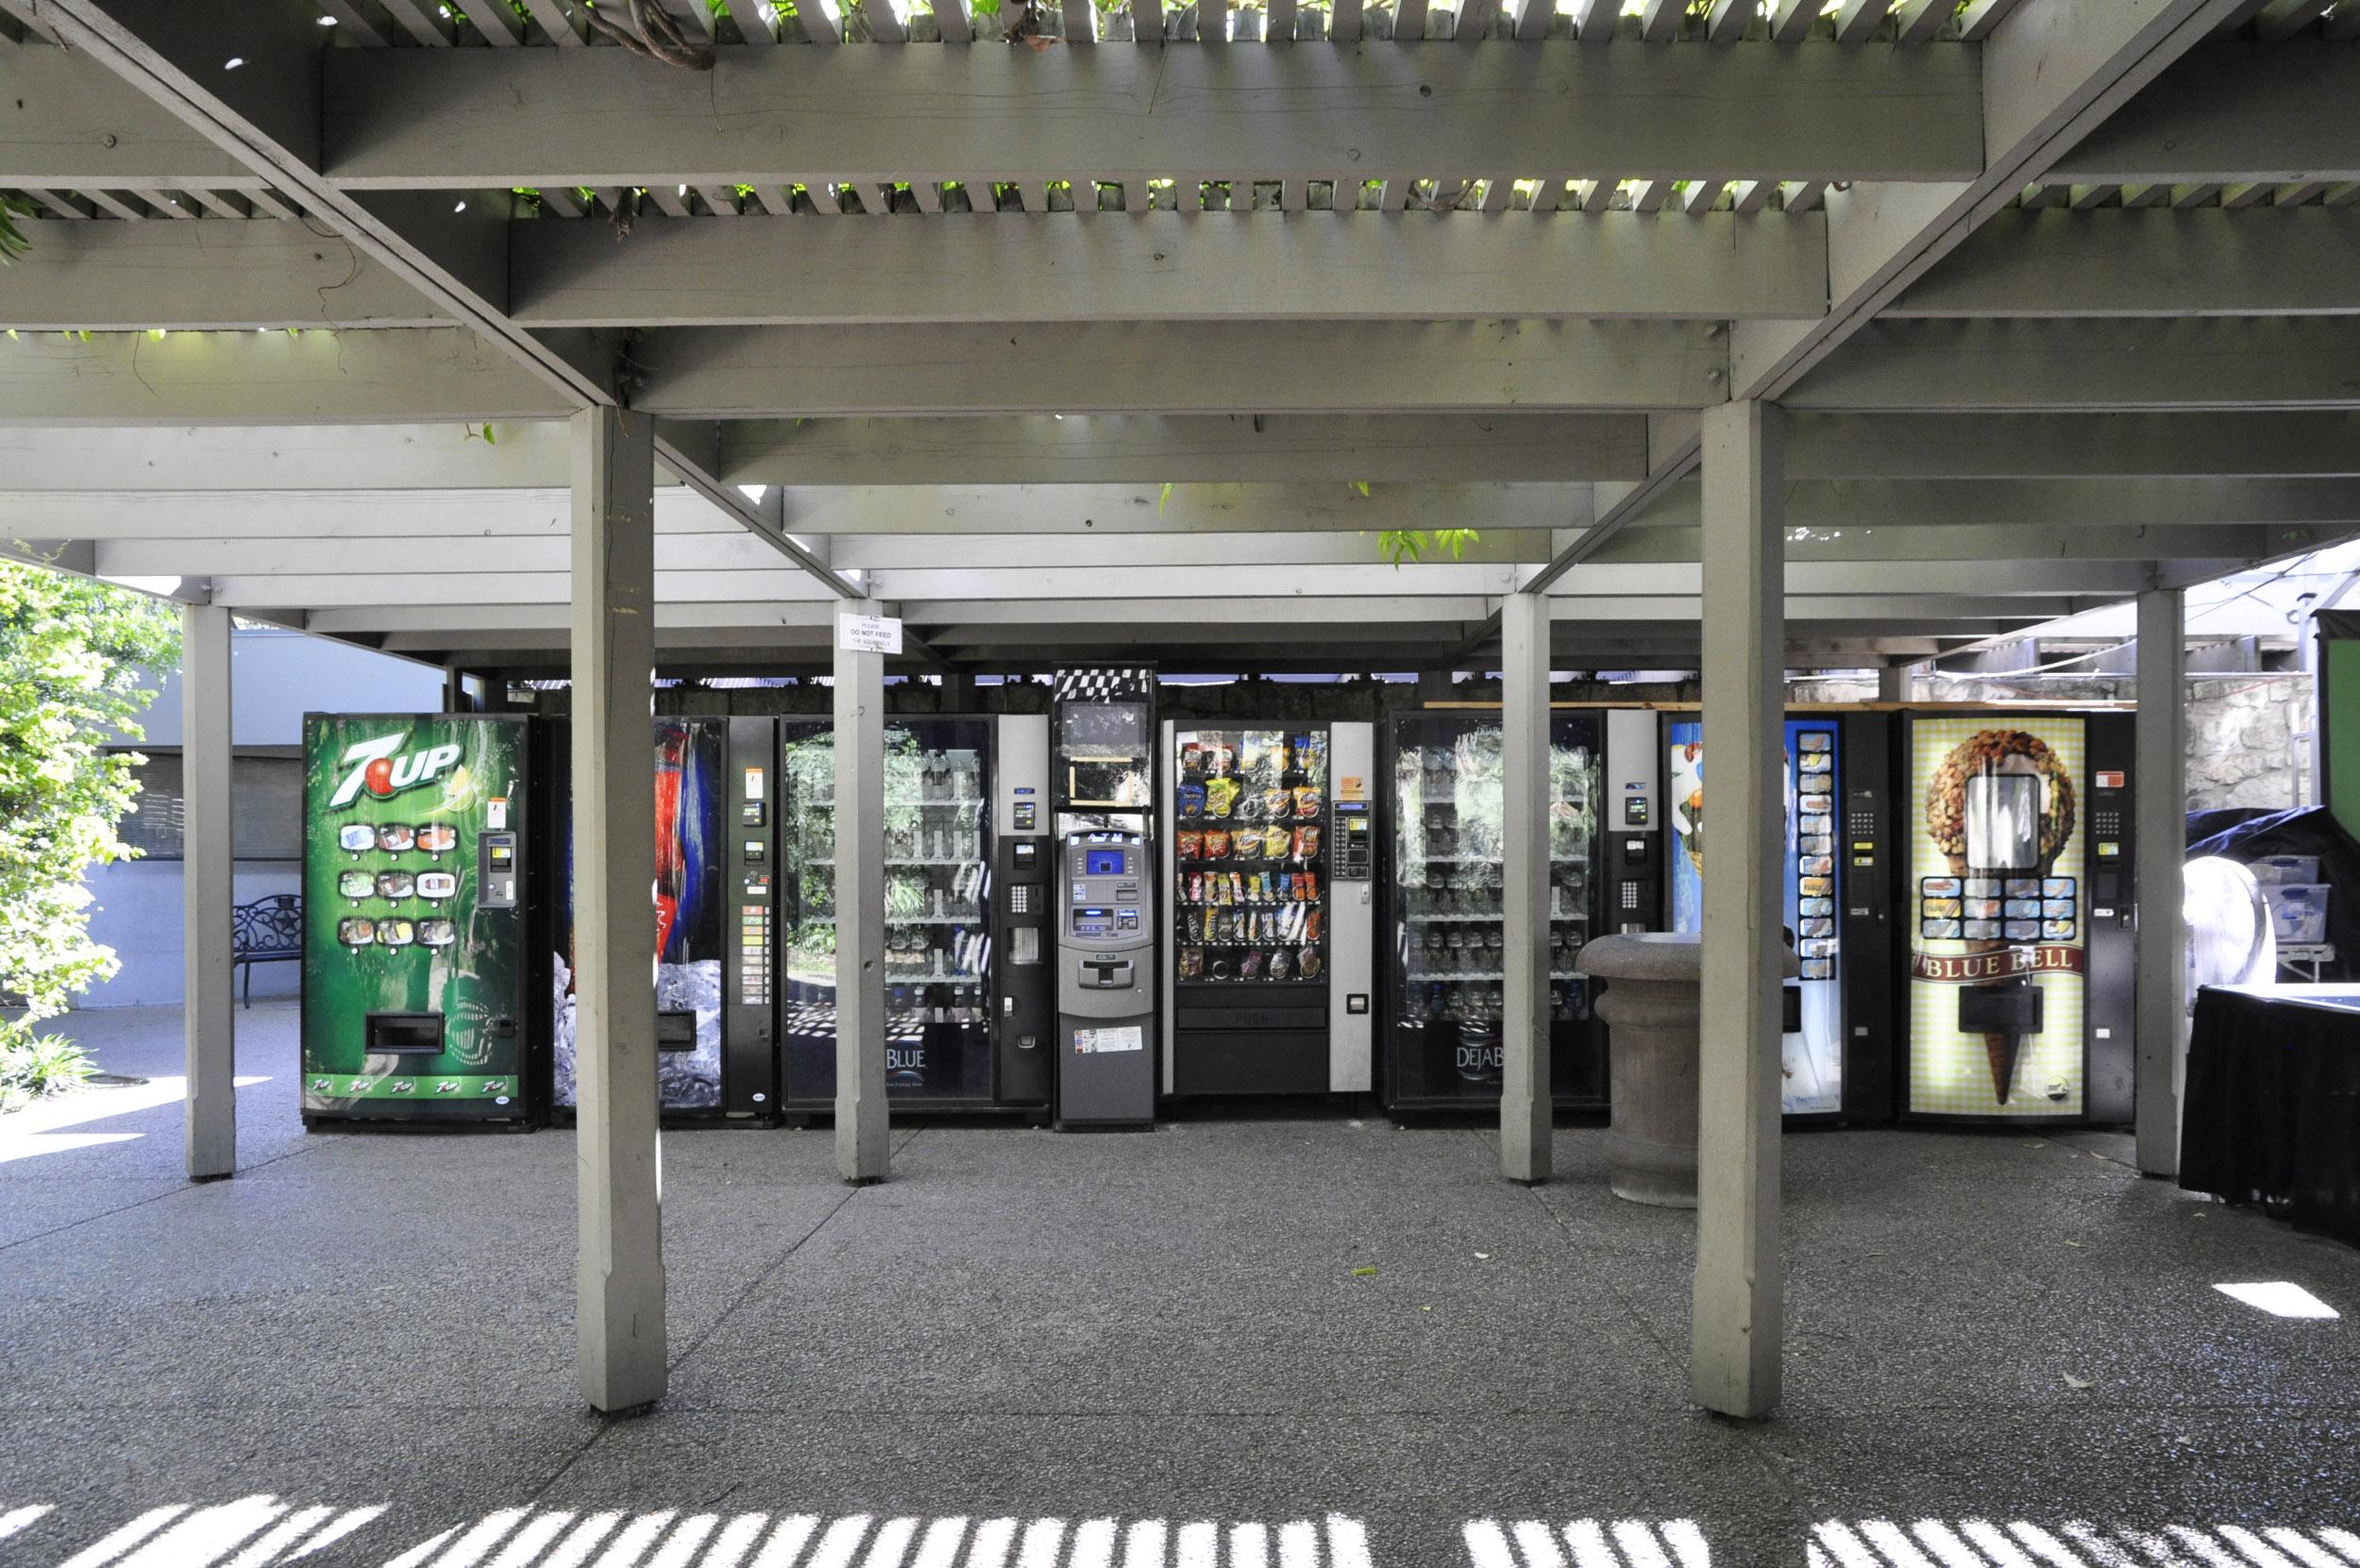 Today's Alamo Plaza is an odd amalgamation of memorialized history and brash commerce. Image courtesy Brantley Hightower.